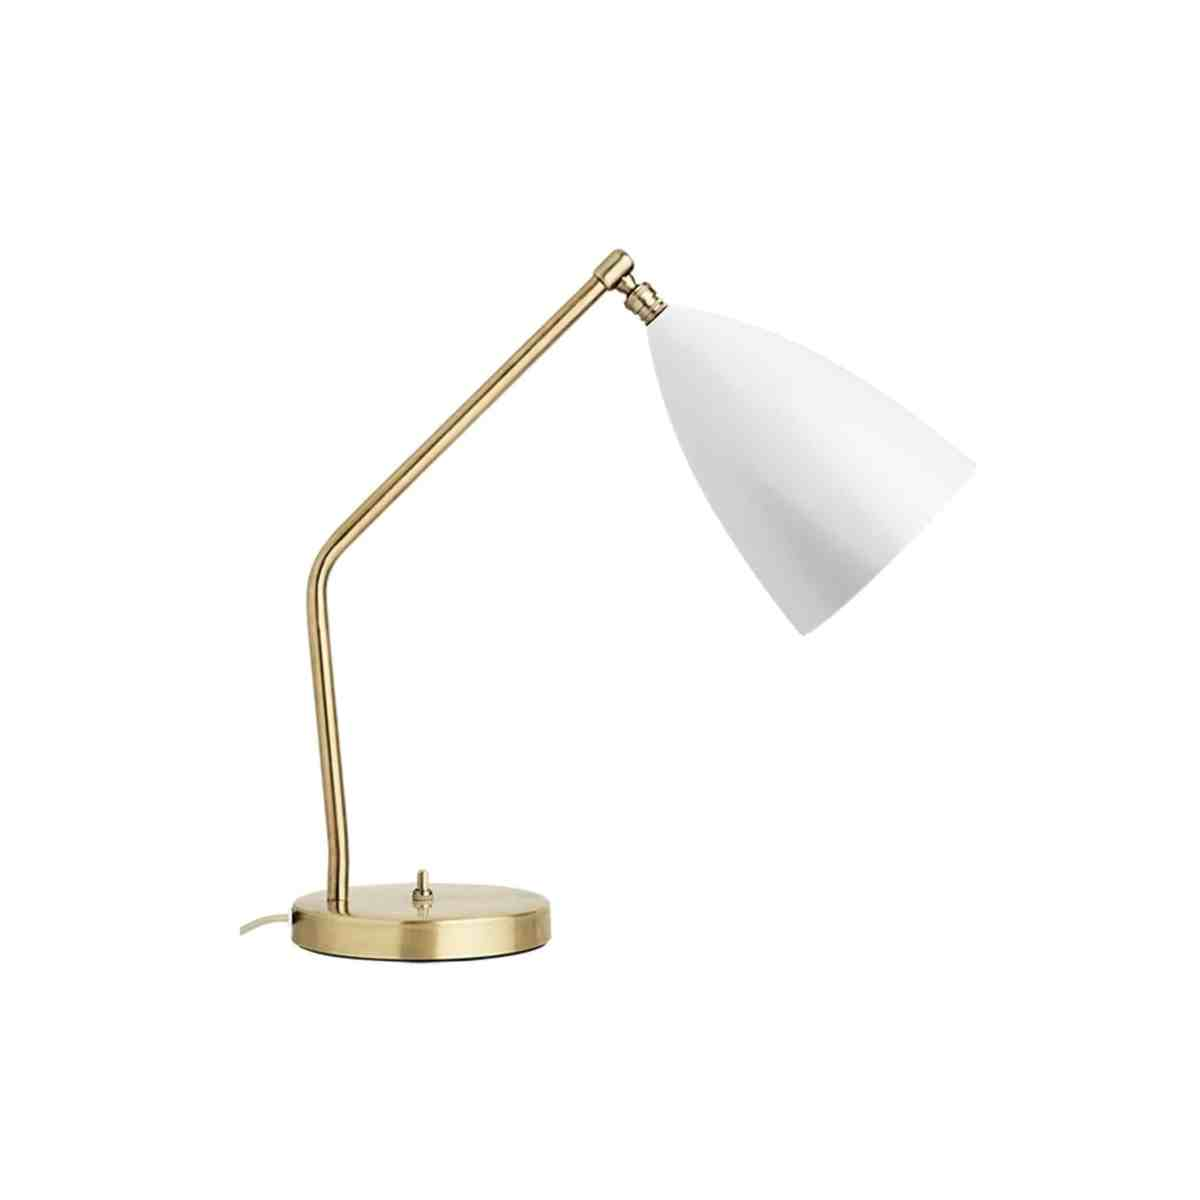 gubi-grasshoppa-task-lamp-matt-white-another-country-001